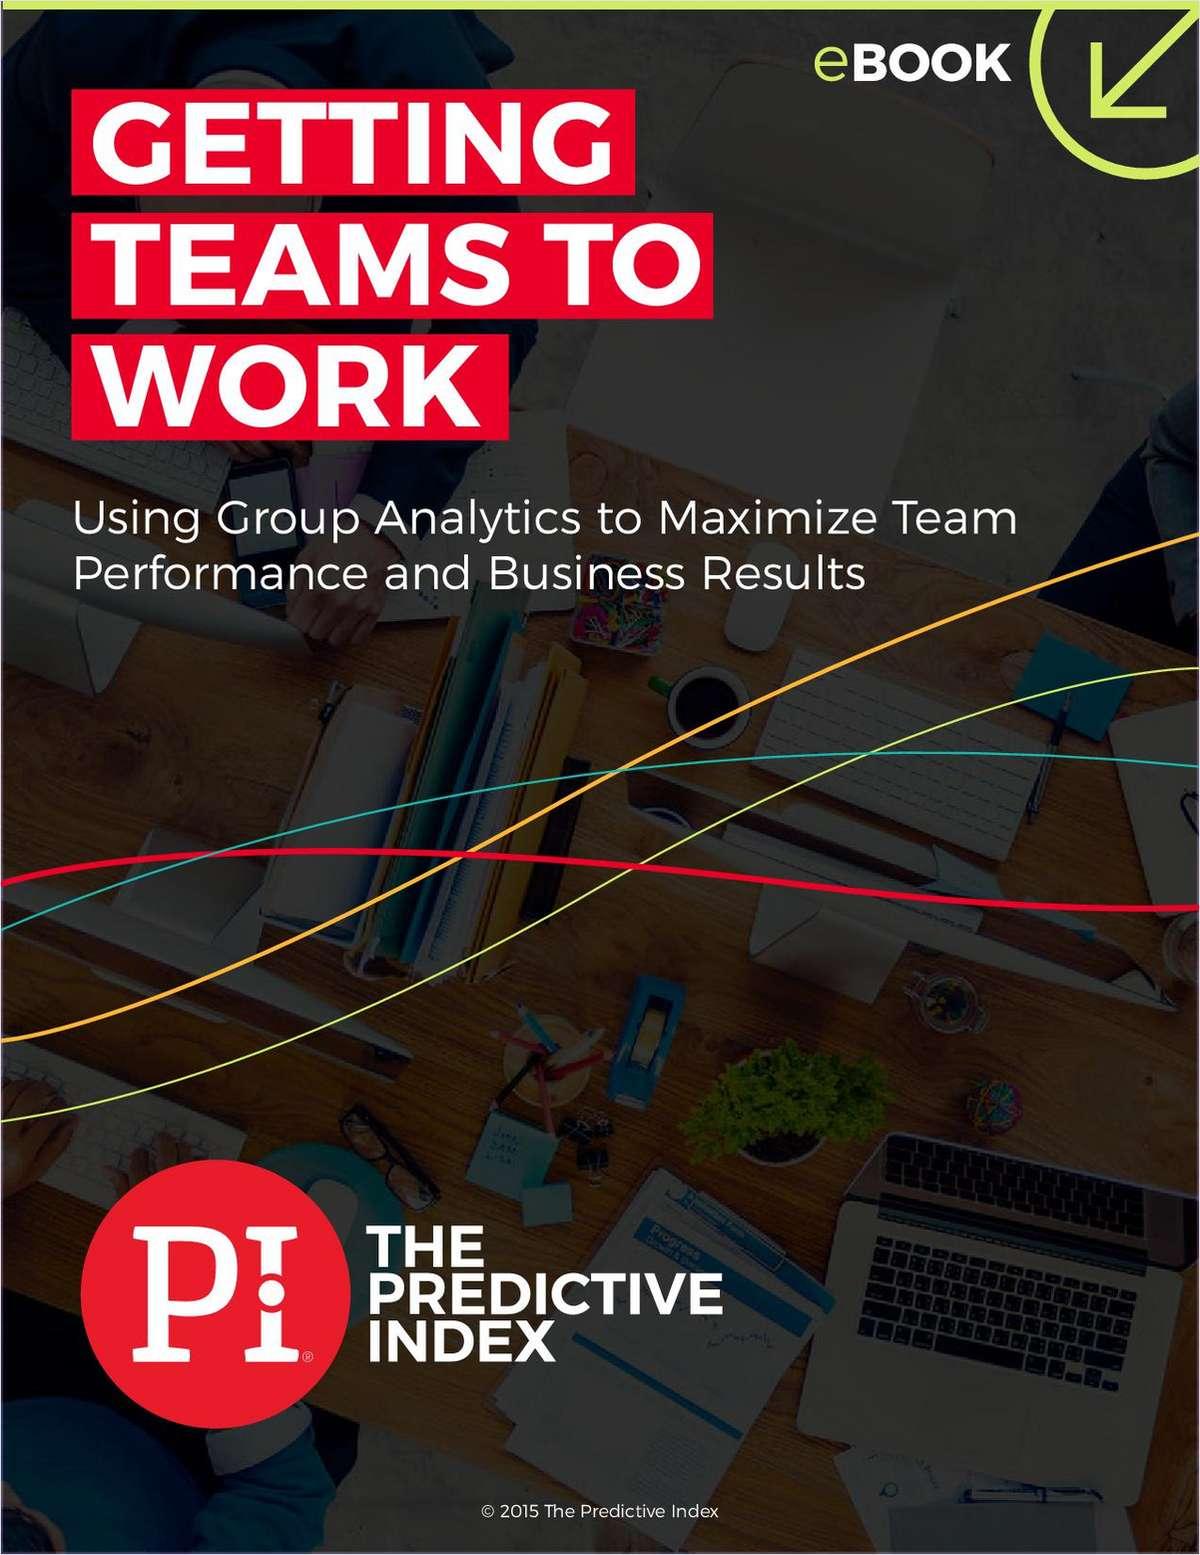 Getting Teams to Work